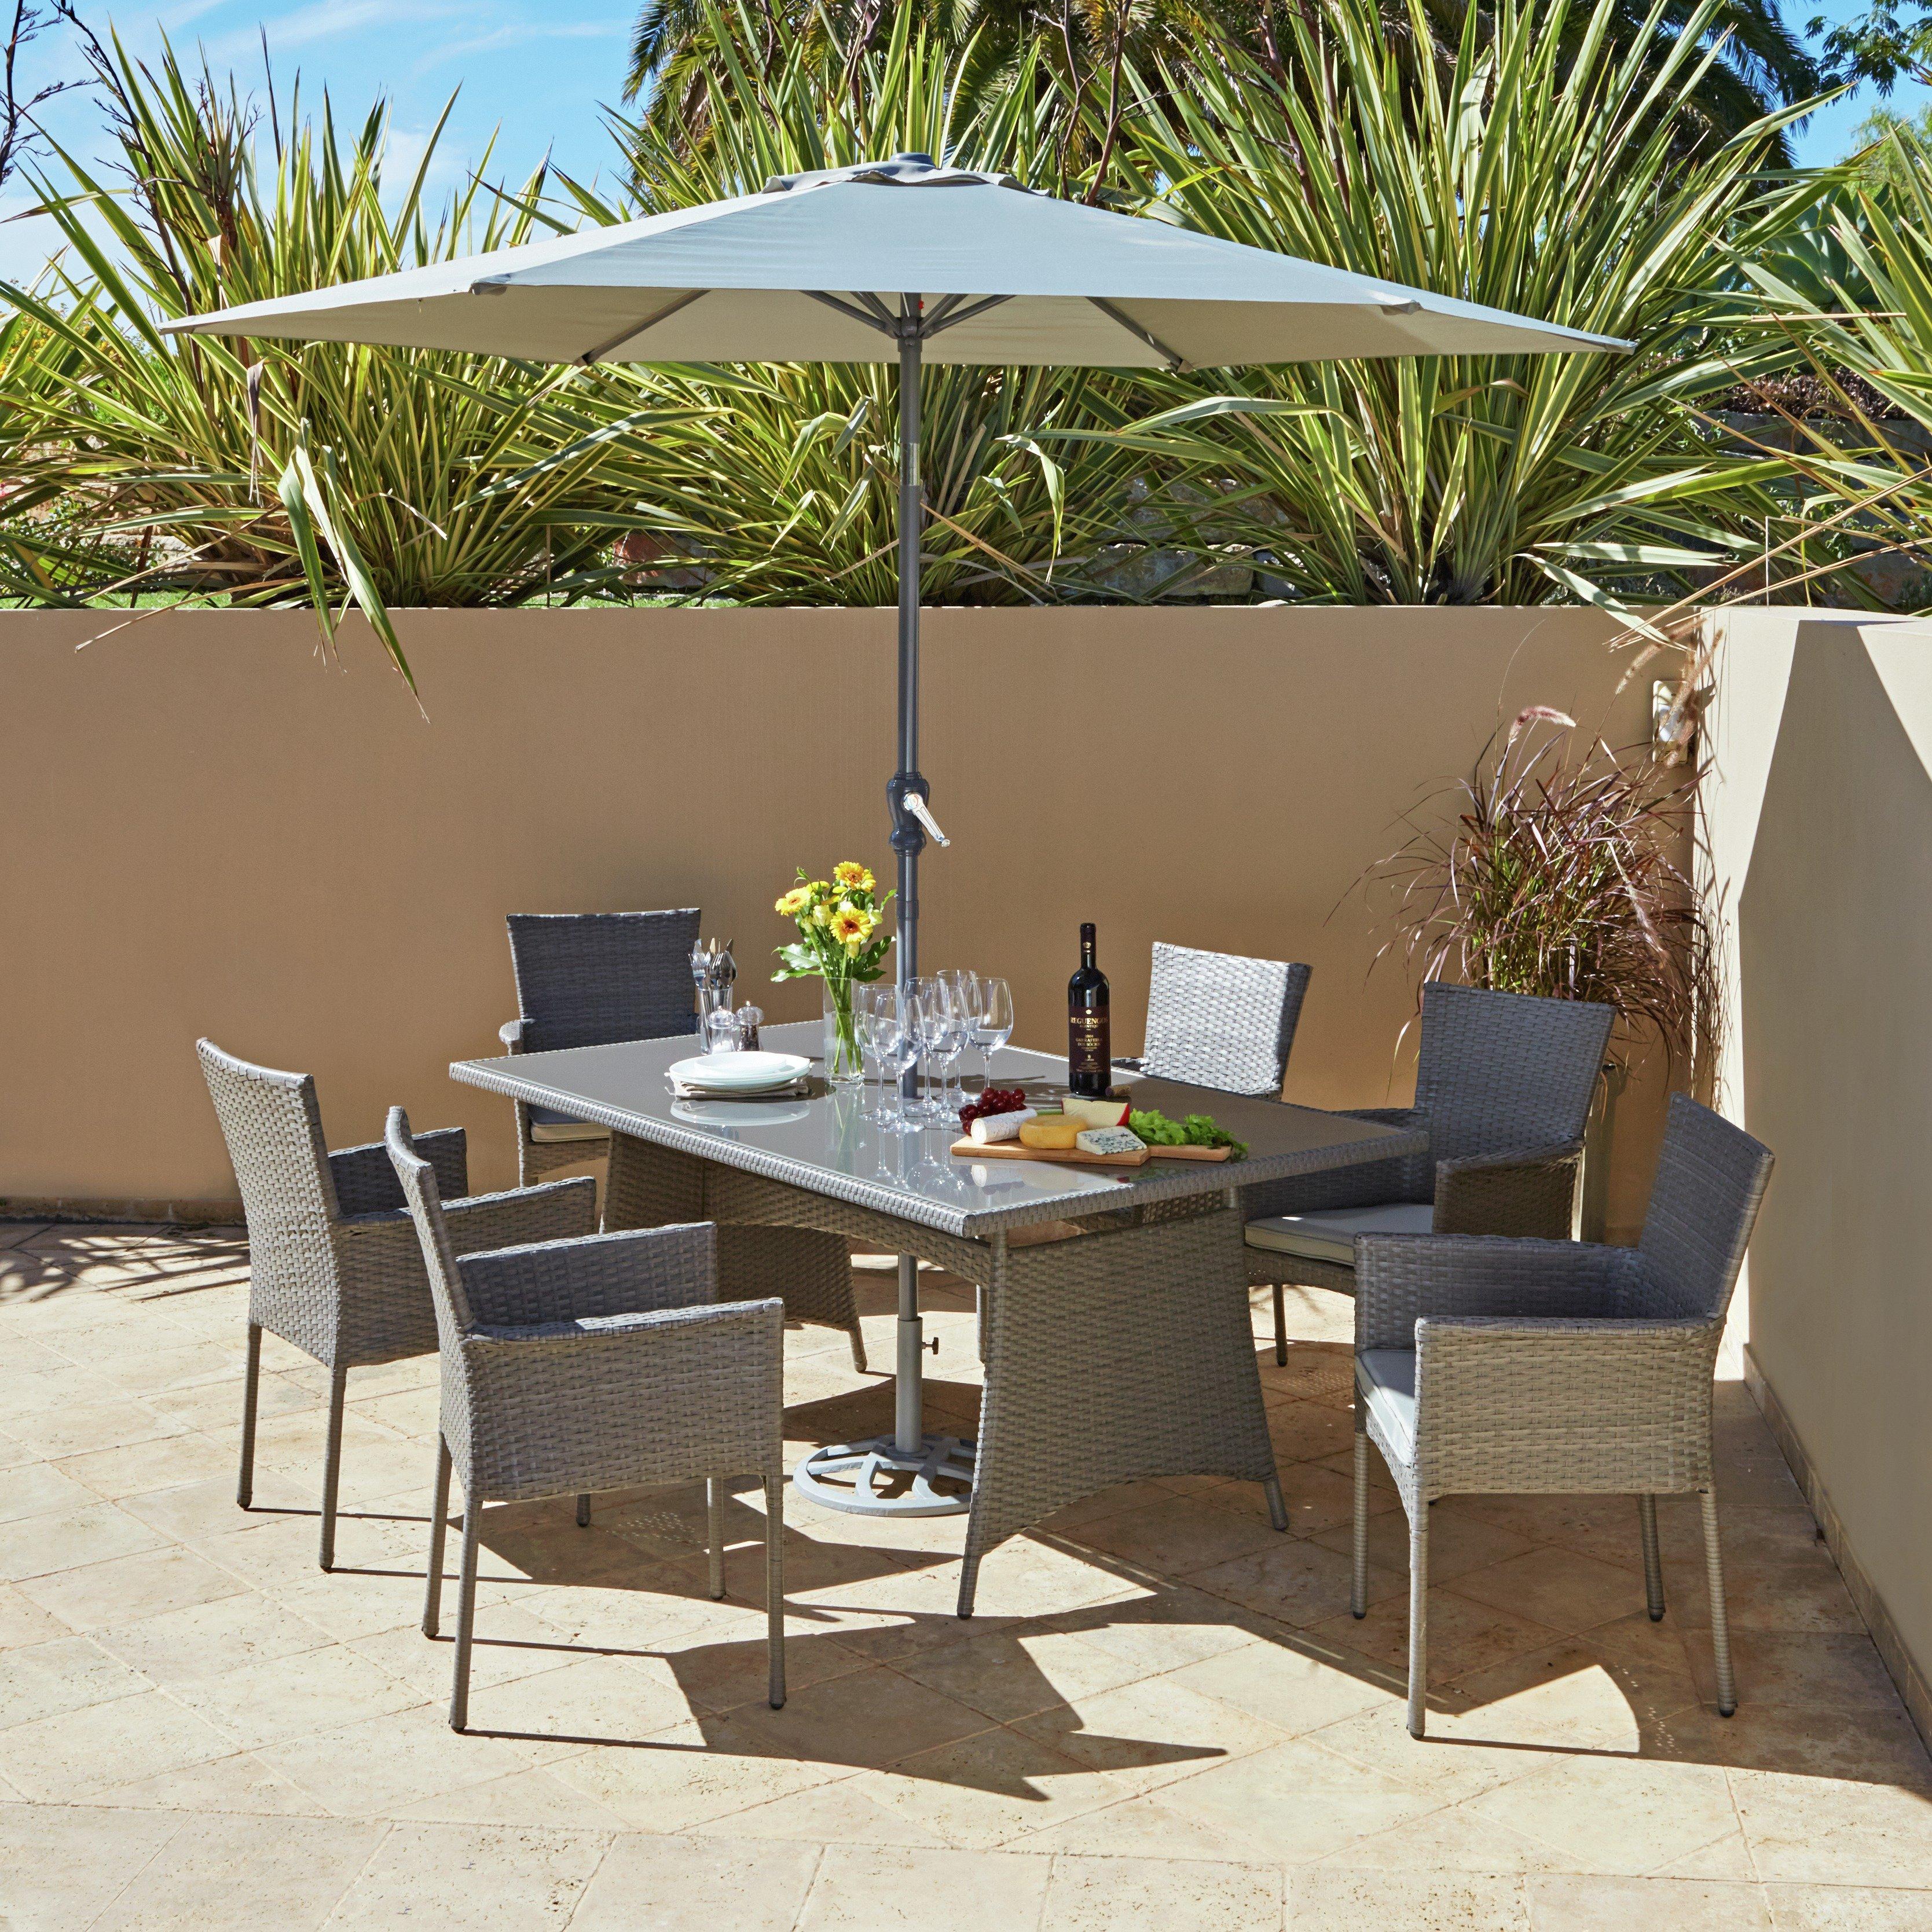 Rattan Garden Furniture 6 Seater 6 seater wooden garden furniture sets | pilotschoolbanyuwangi